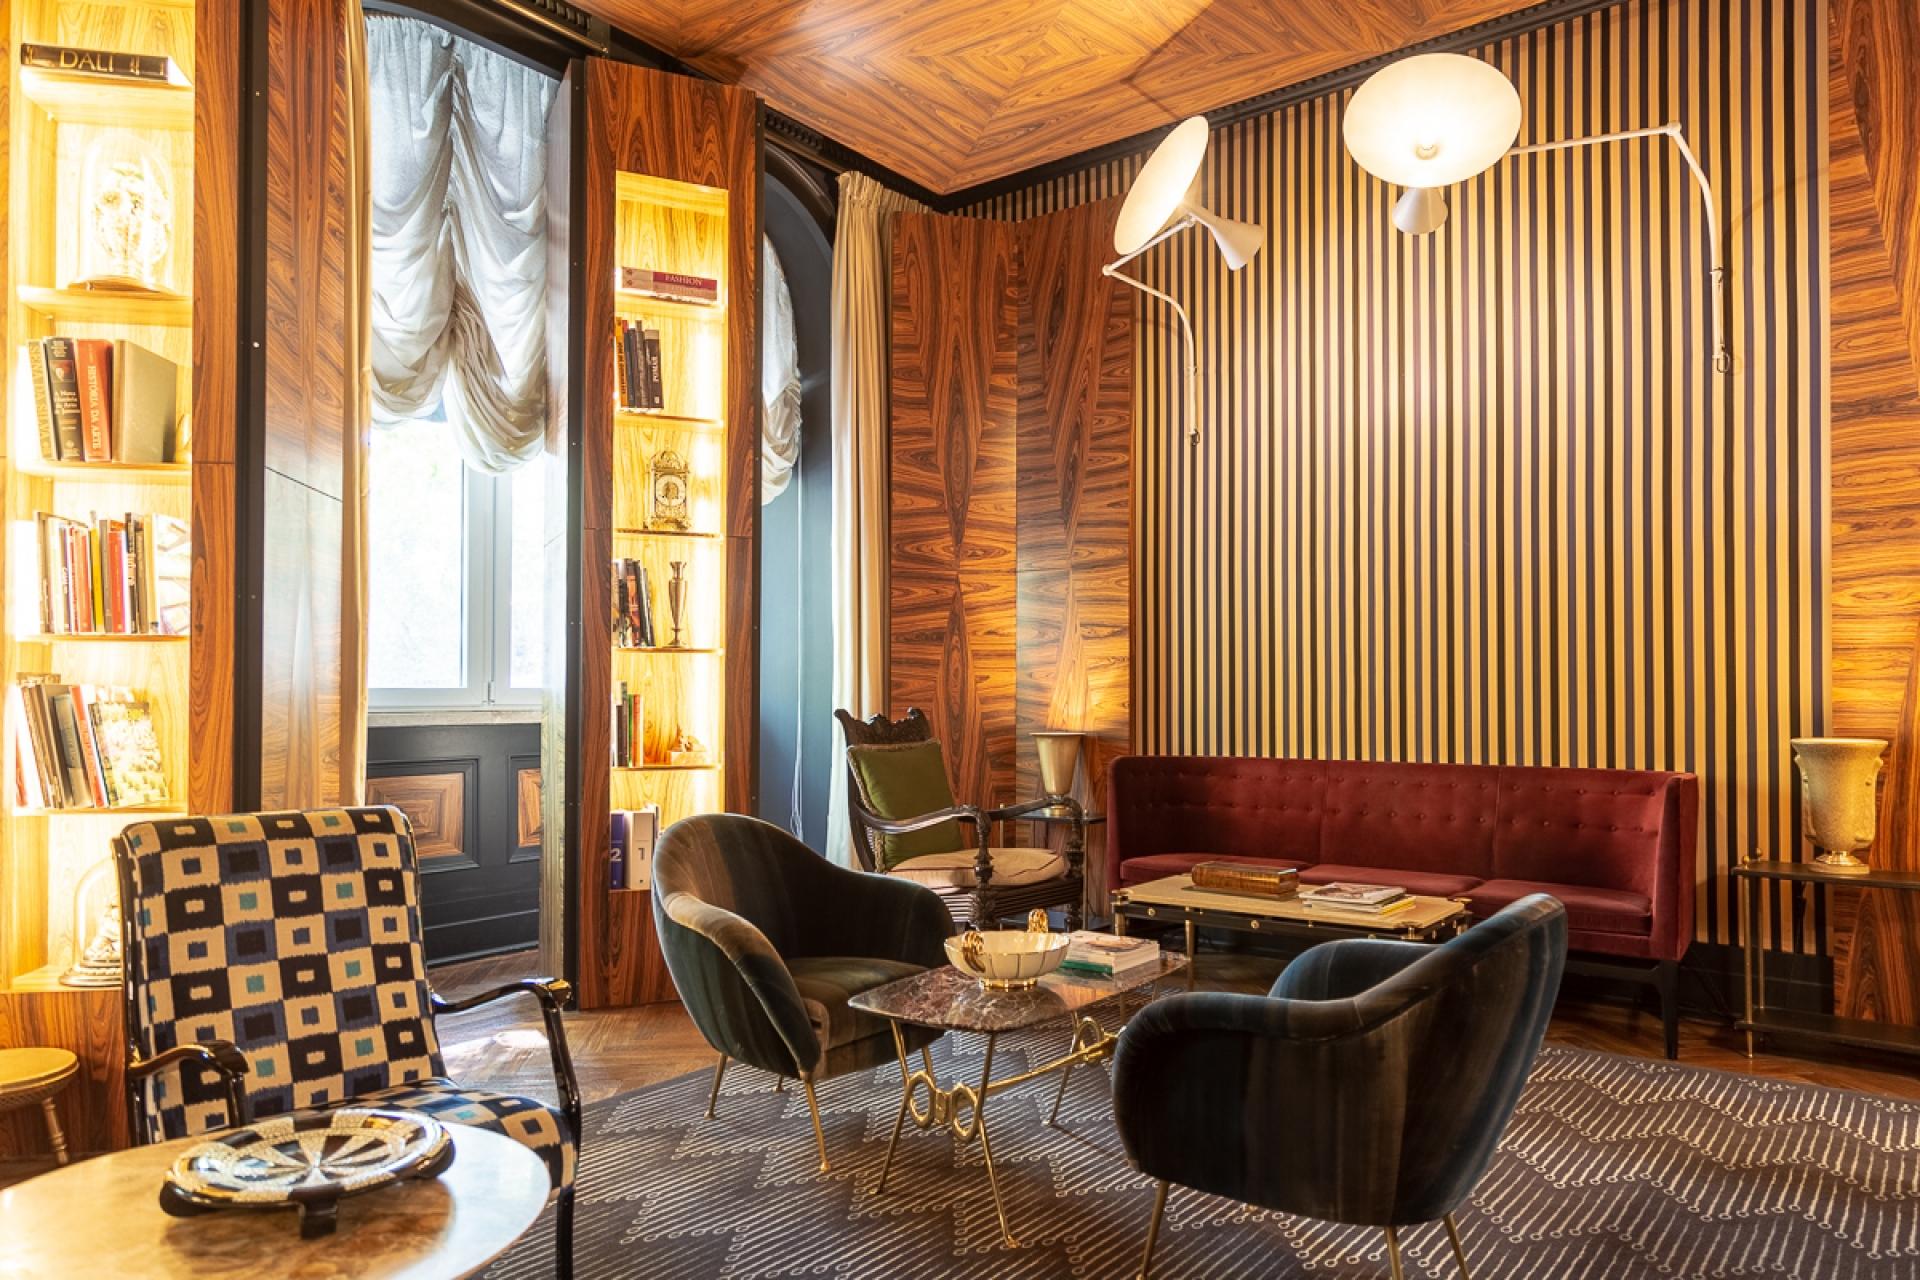 LisboaCool_Dormir_Hotel_Valverde